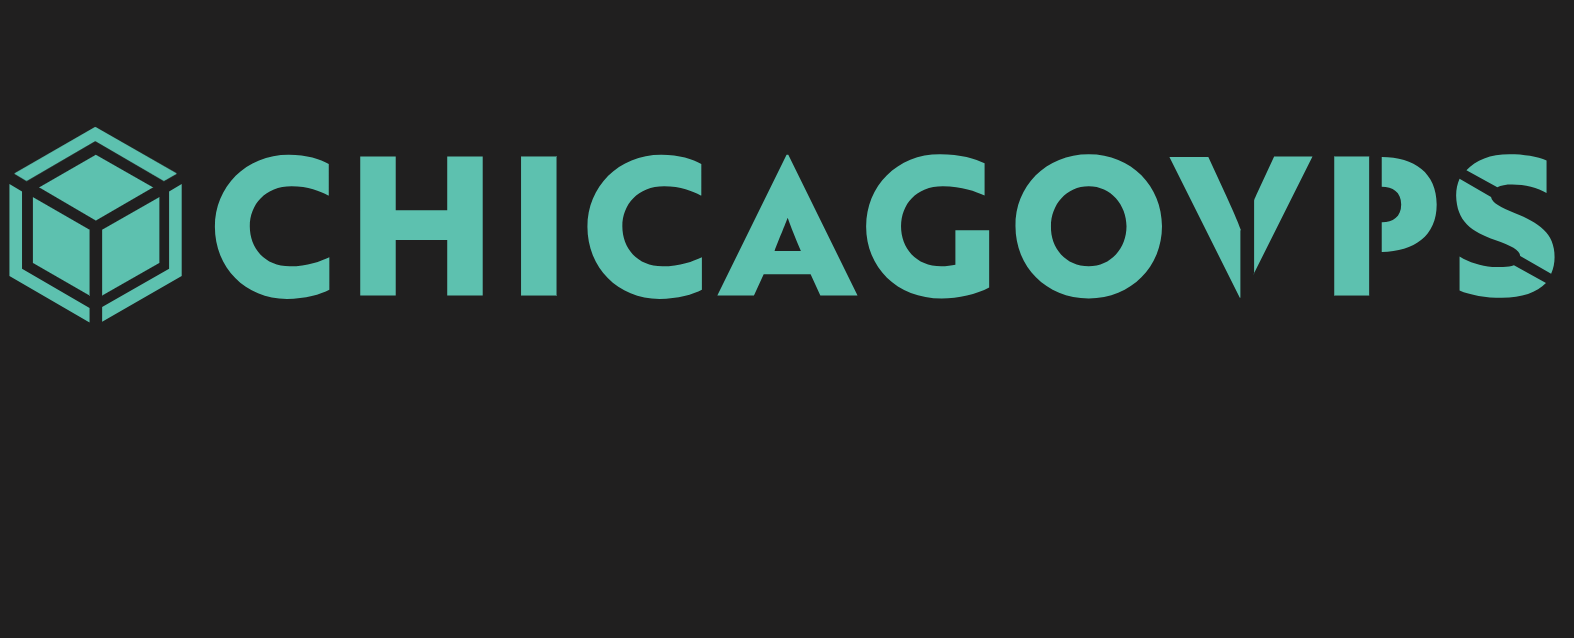 ChicagoVPS年付30美元1GB KVM Linux VPS-2018年黑色星期五,ChicagoVPS购买链接以及ChicagoVPS优惠码和ChicagoVPS官方网站